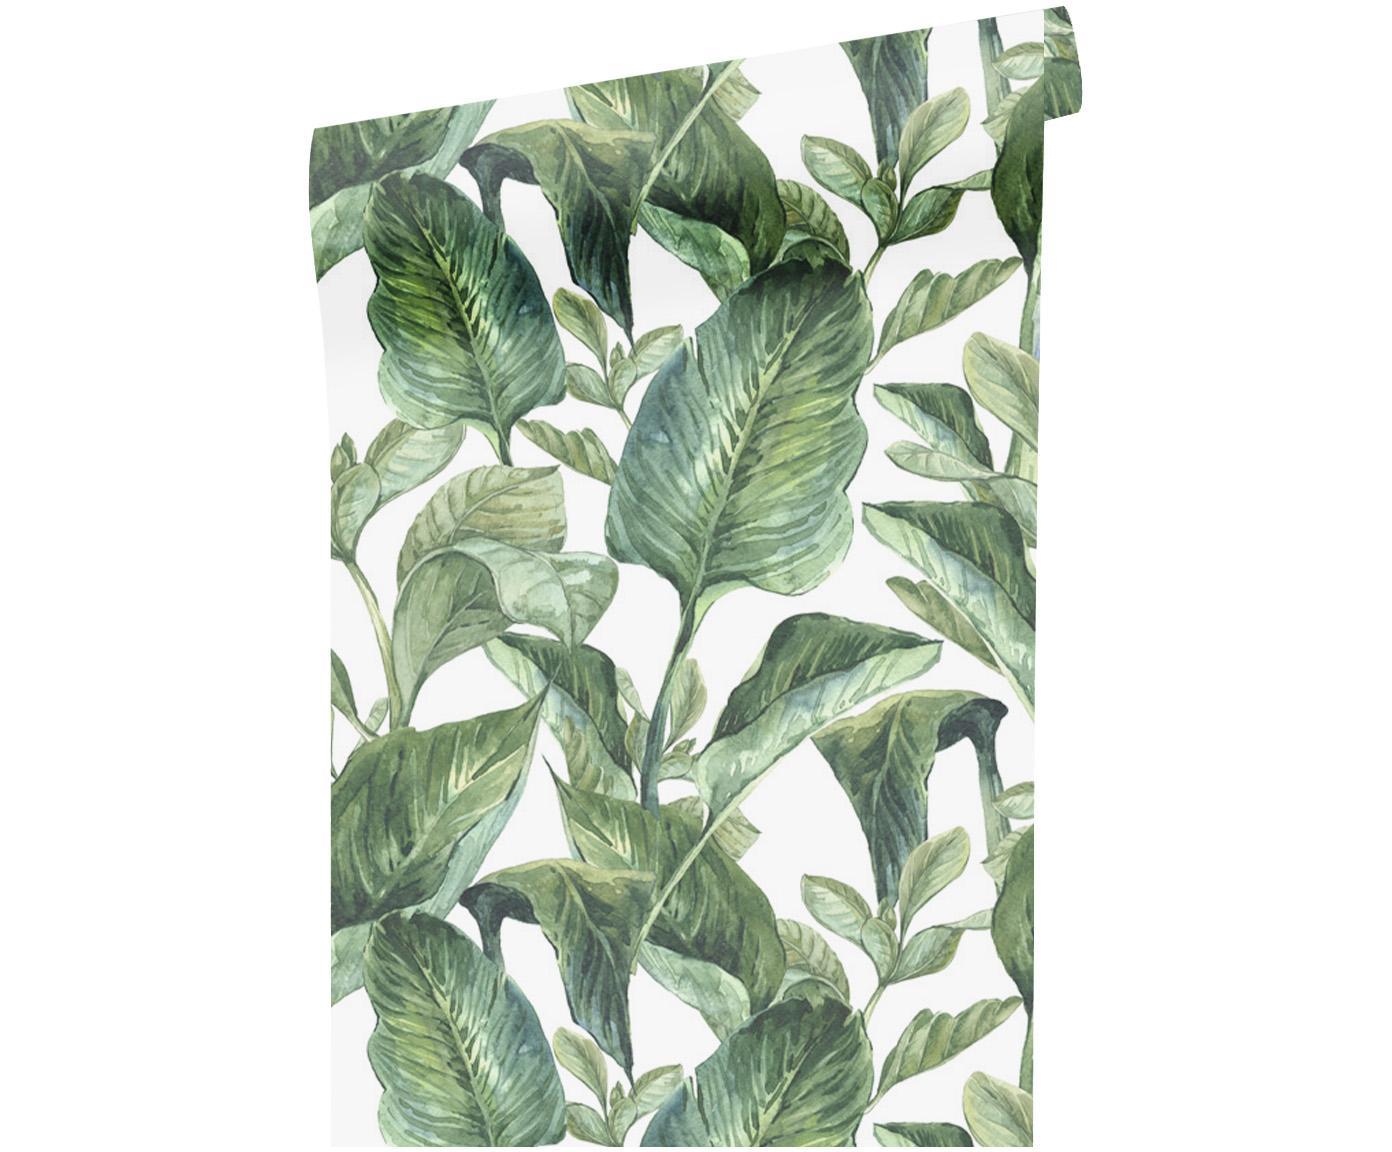 Papel pintado adhesivo Leaves, Lámina de vinilo adhesiva, Blanco, verde, An 90 x L 250 cm